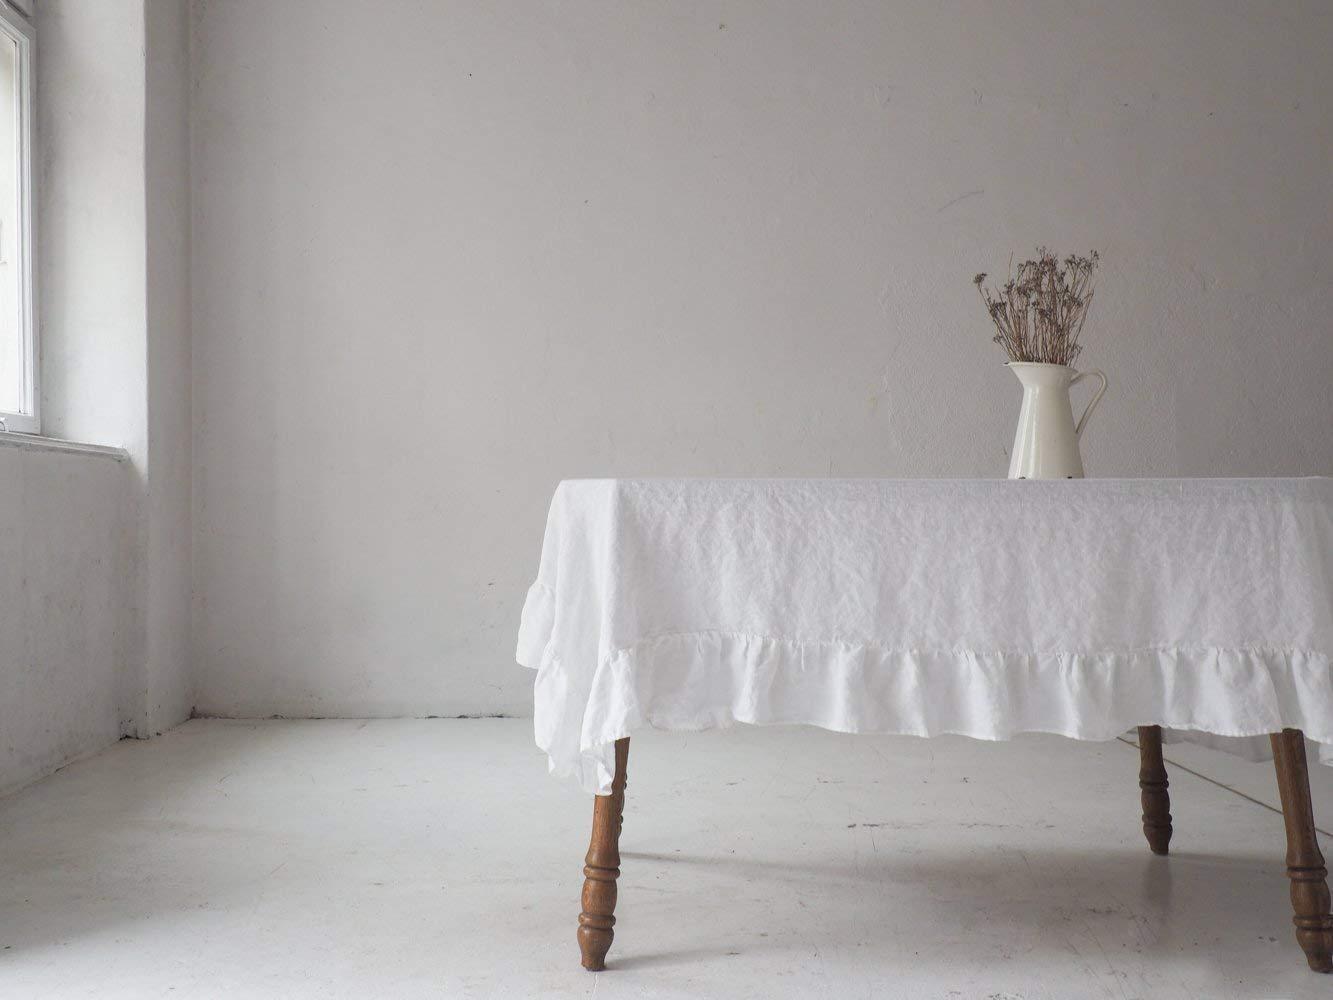 Linen tablecloth, ruffled linen tablecloth, white linen tablecloth